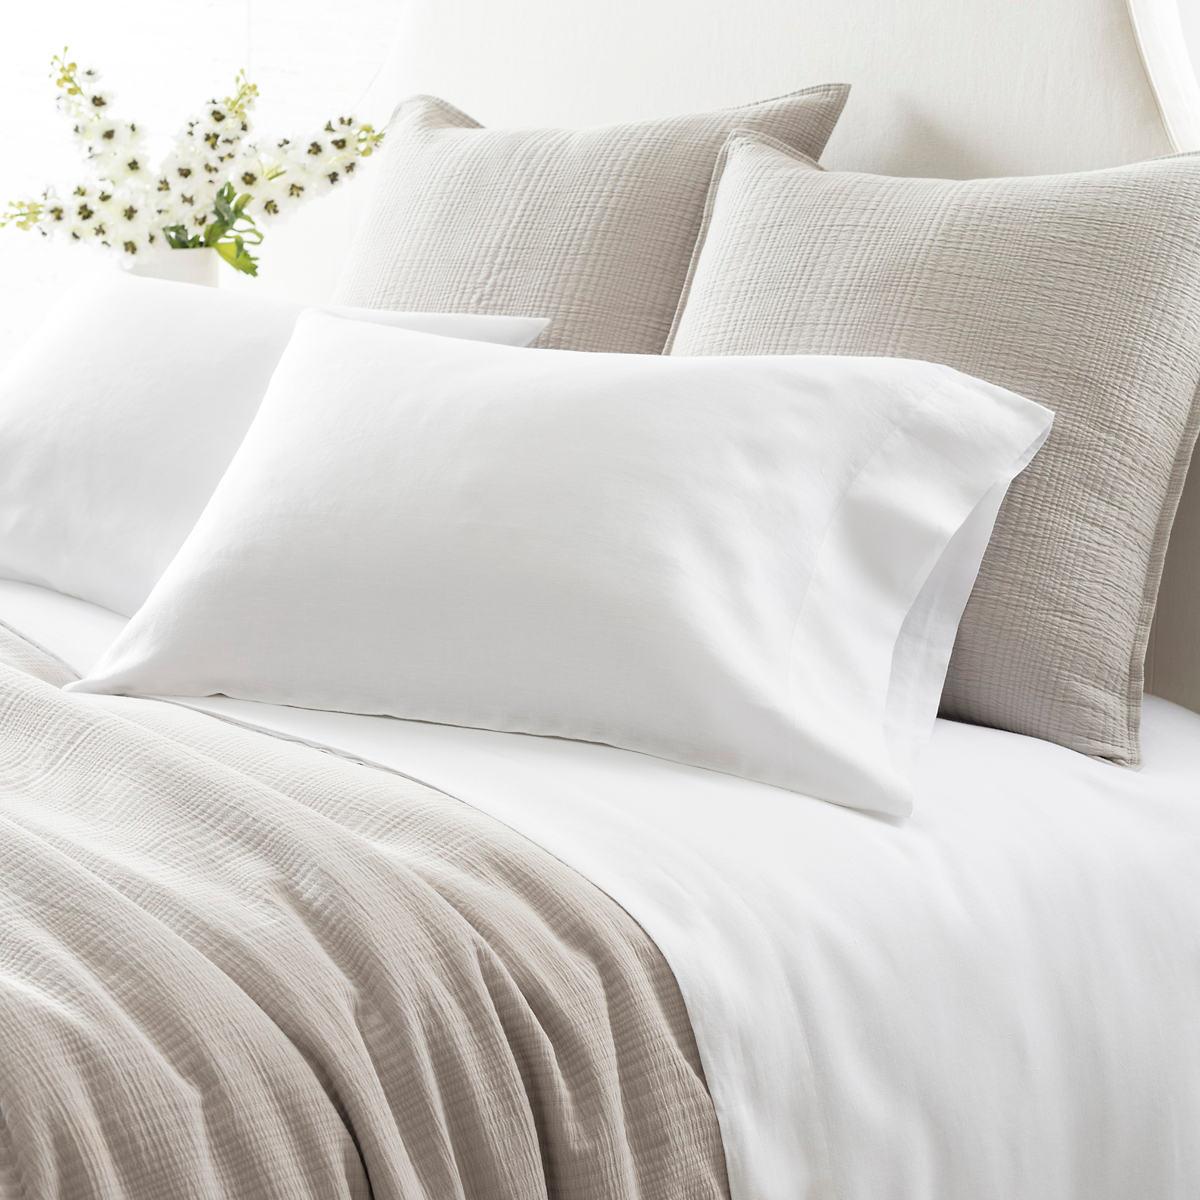 Lush Linen White Sheet Set